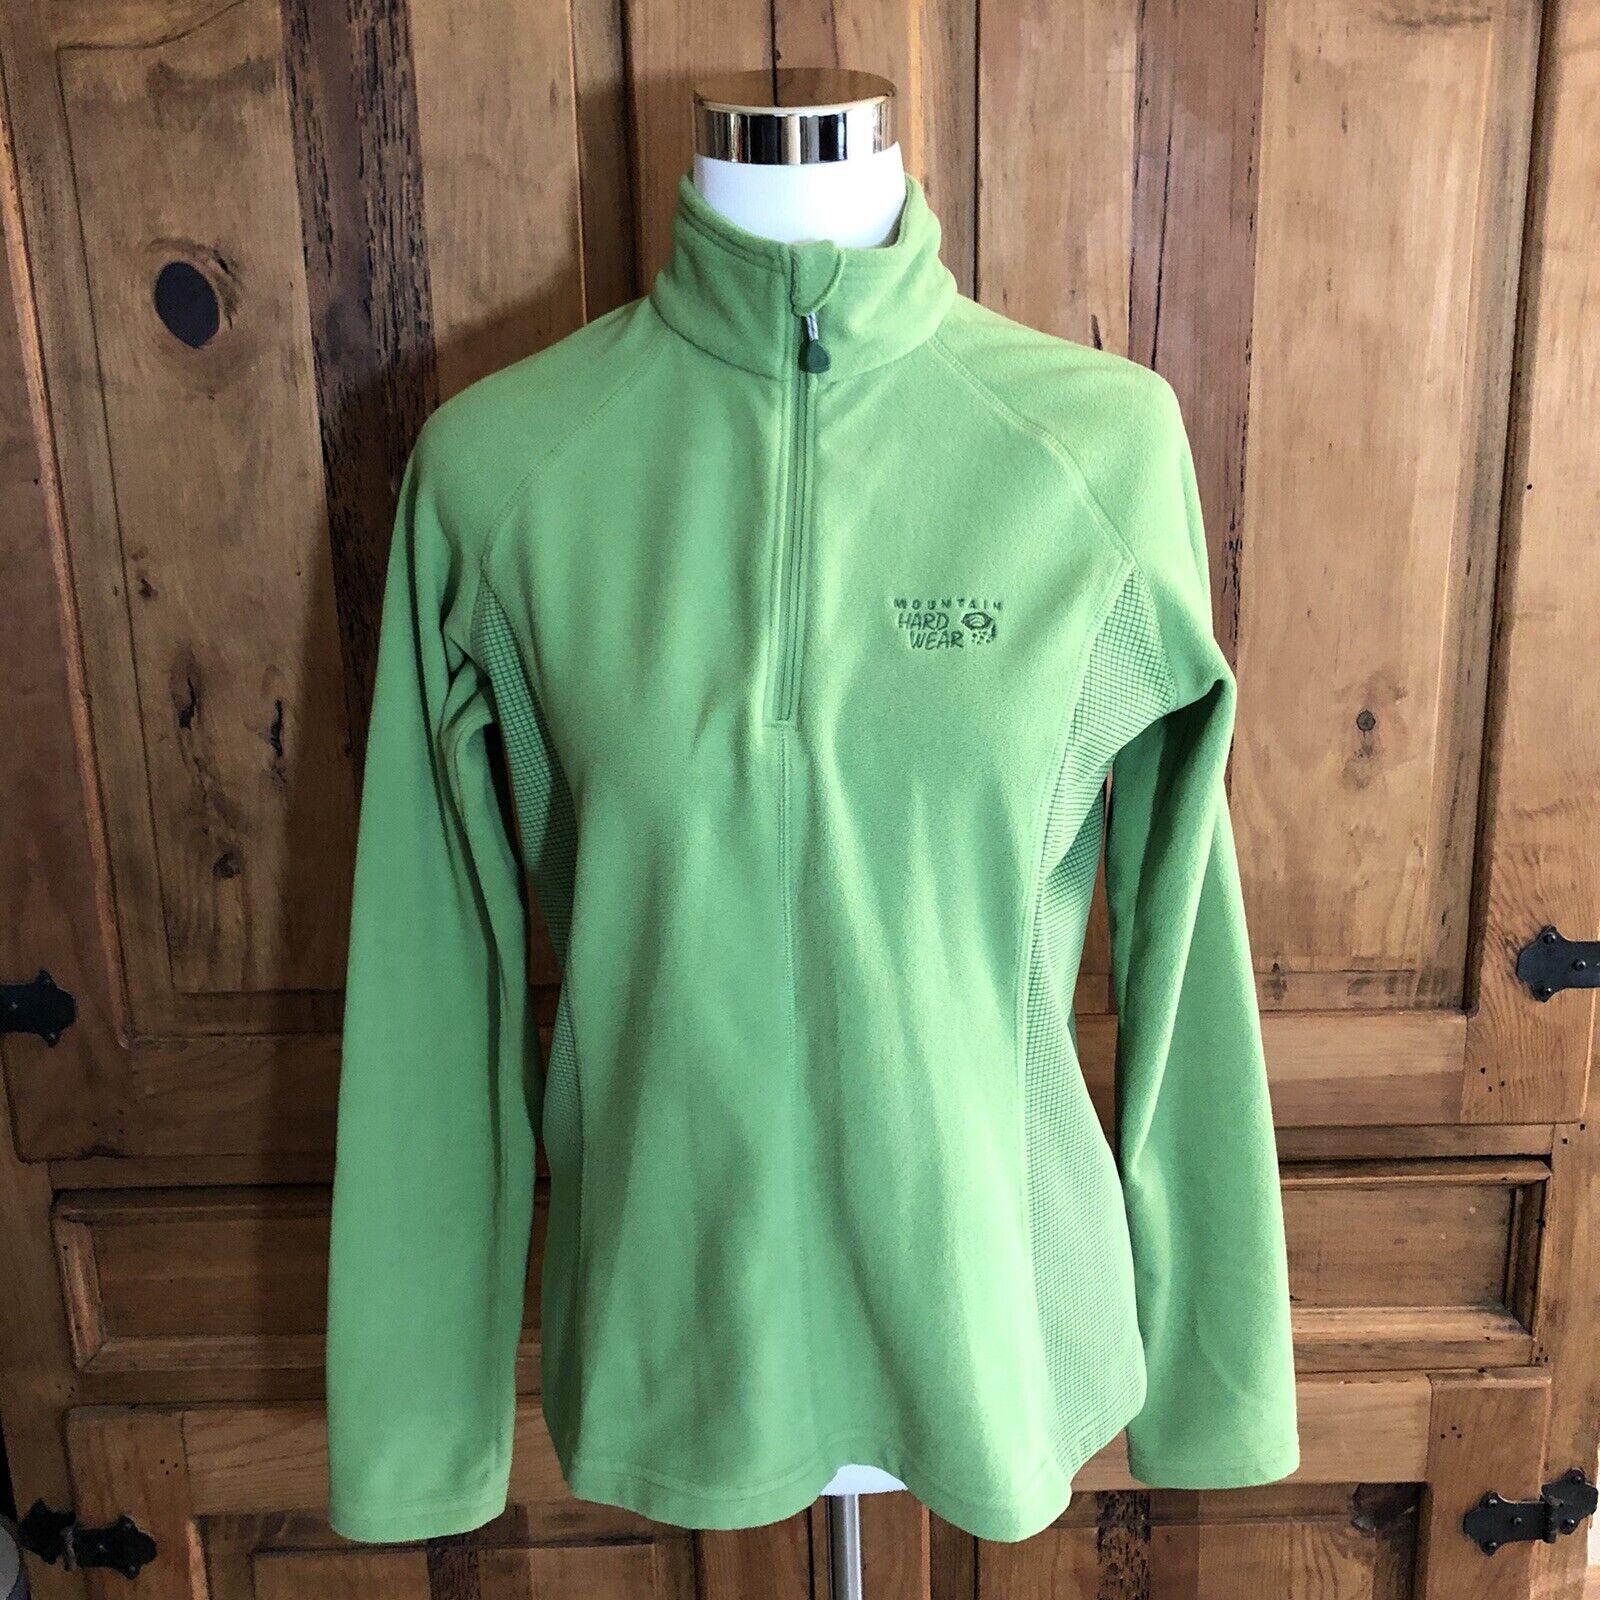 Women's Mountain Hardwear Fleece Quarter Zip Green Pullover Sweatershirt M